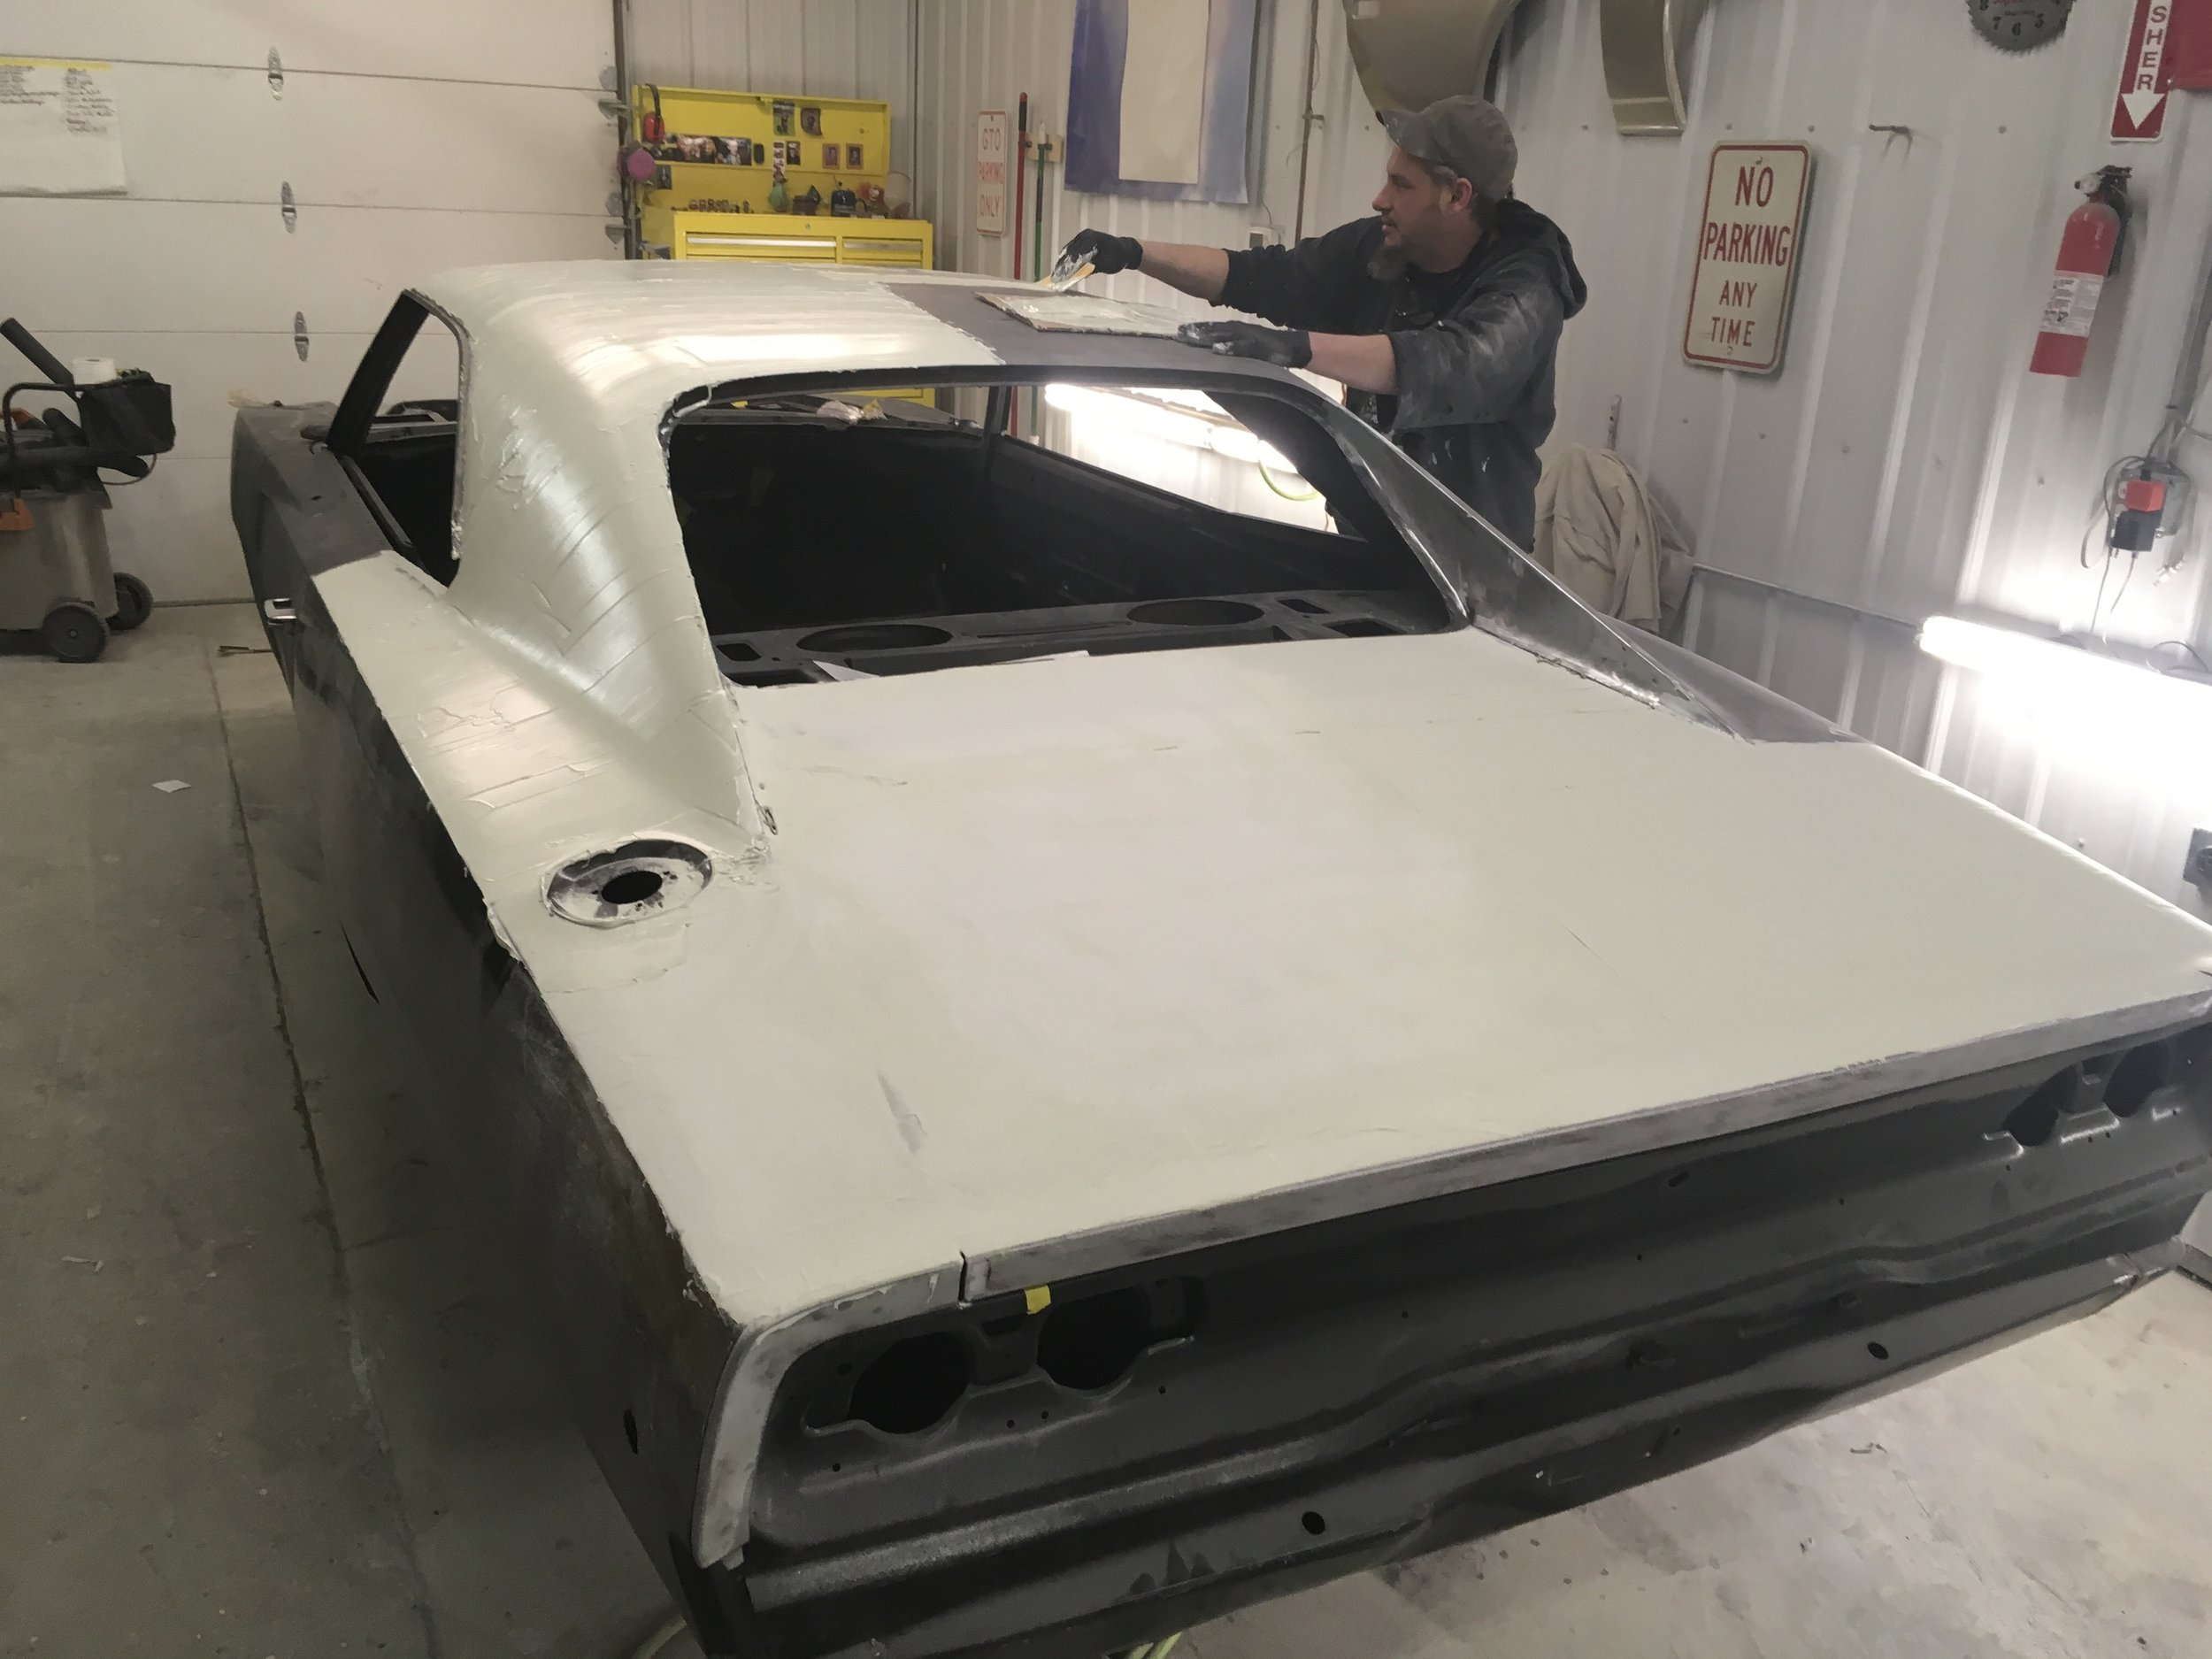 1968-Hell-Cat-Charger-minneapolis-hot-rod-custom-build-restoration-9.jpg